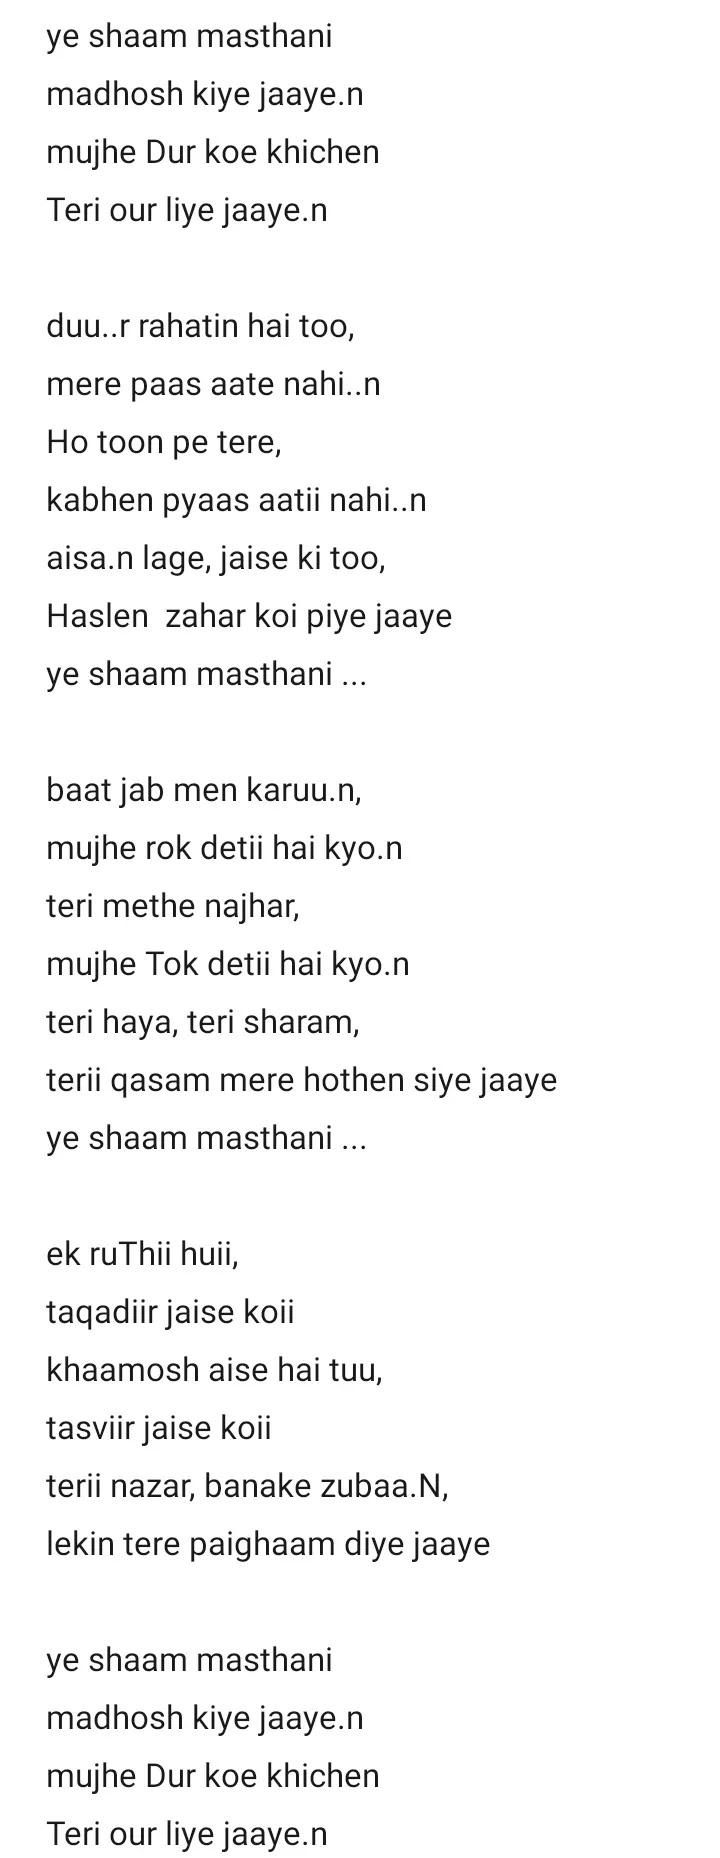 Ye Sham Mastani lyrics ये शाम मस्तानी  - kishore kumar   Kati patang